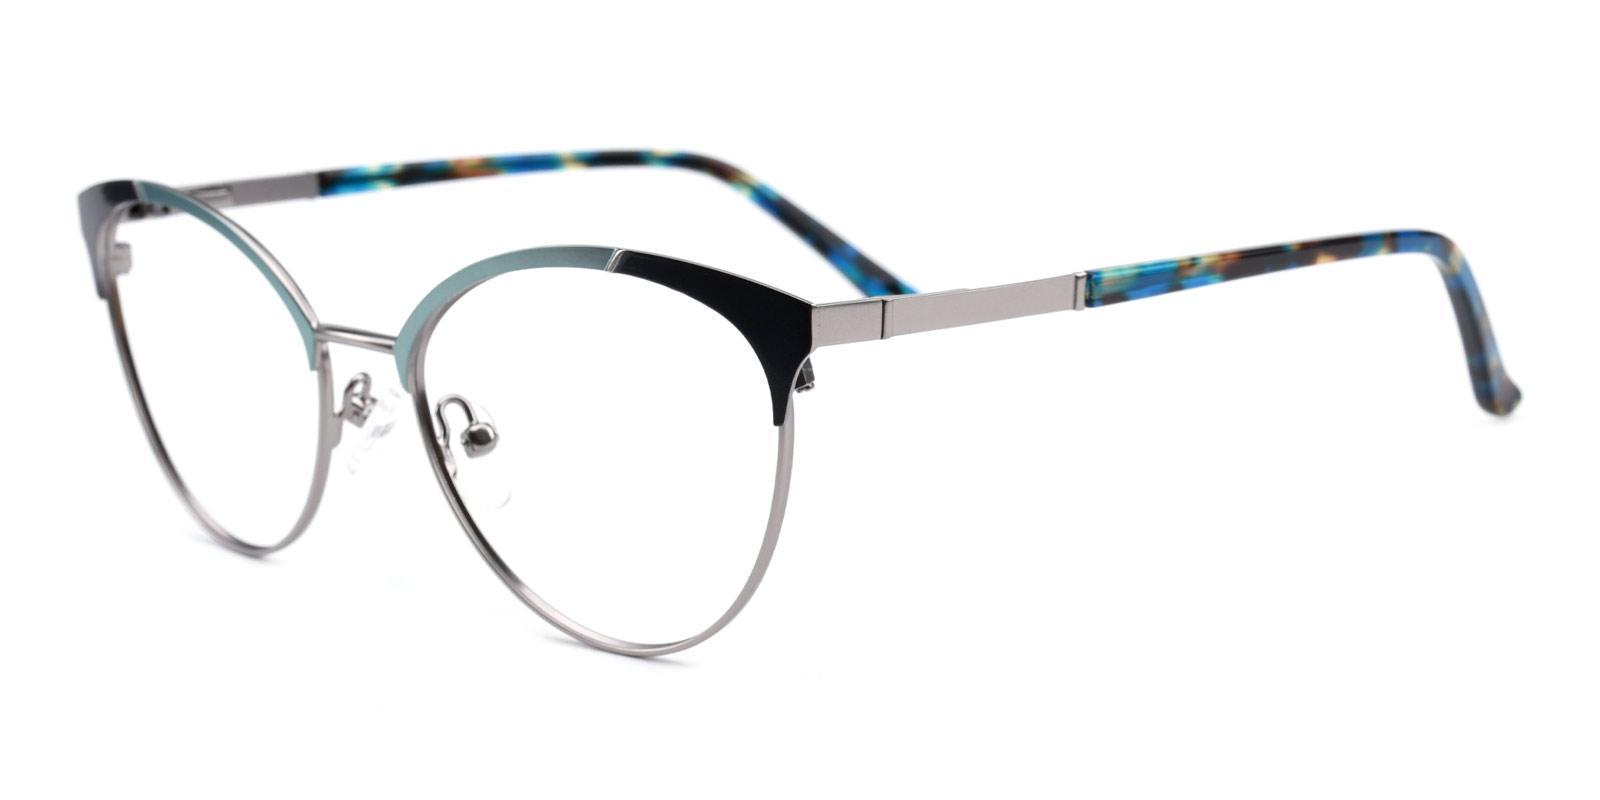 Hobbit-Blue-Cat-Metal-Eyeglasses-additional1